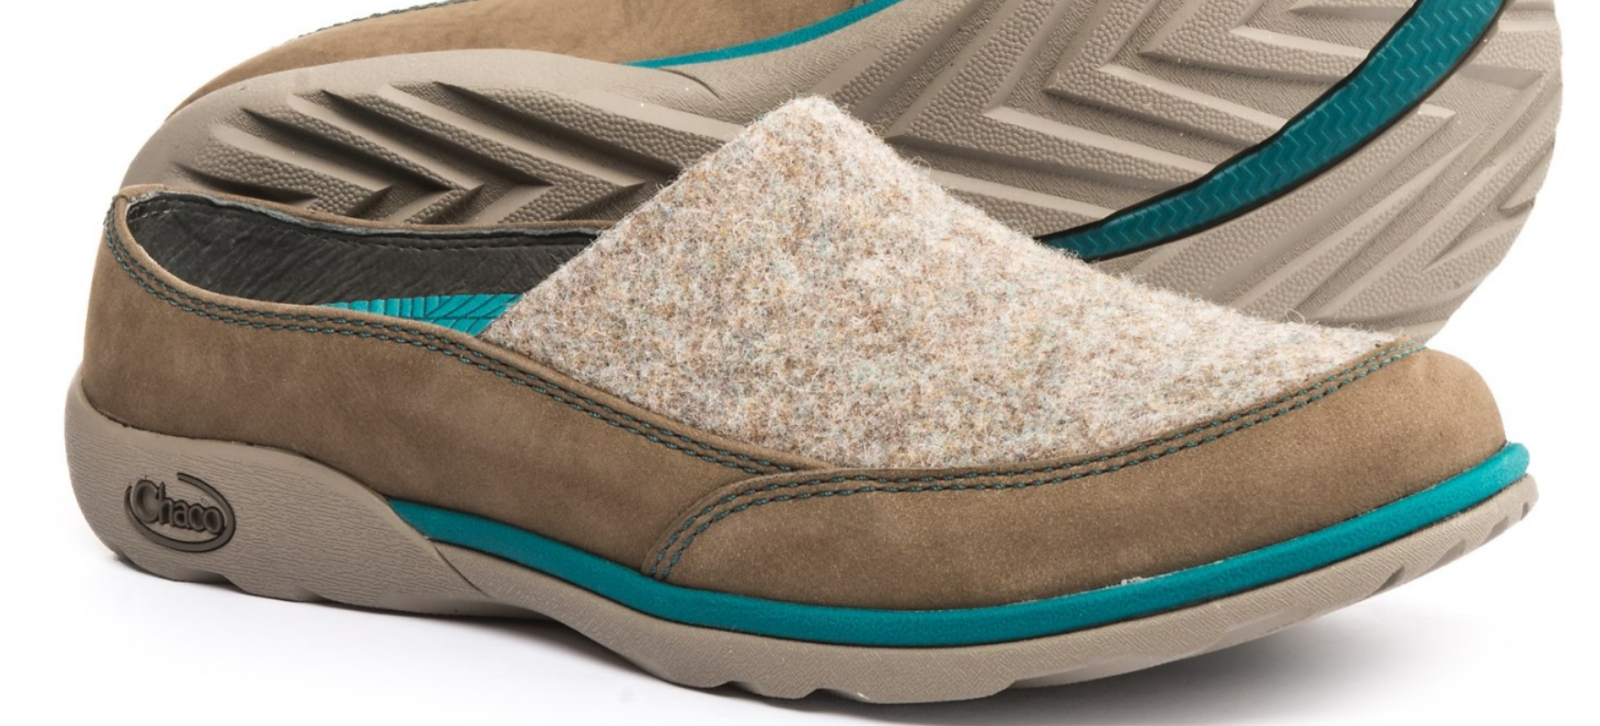 NEWS CHACO QUINN MULES SLIP ON  Schuhe Damenschuhe 9.5 J105400 SANDSTONE  FREE SHIP